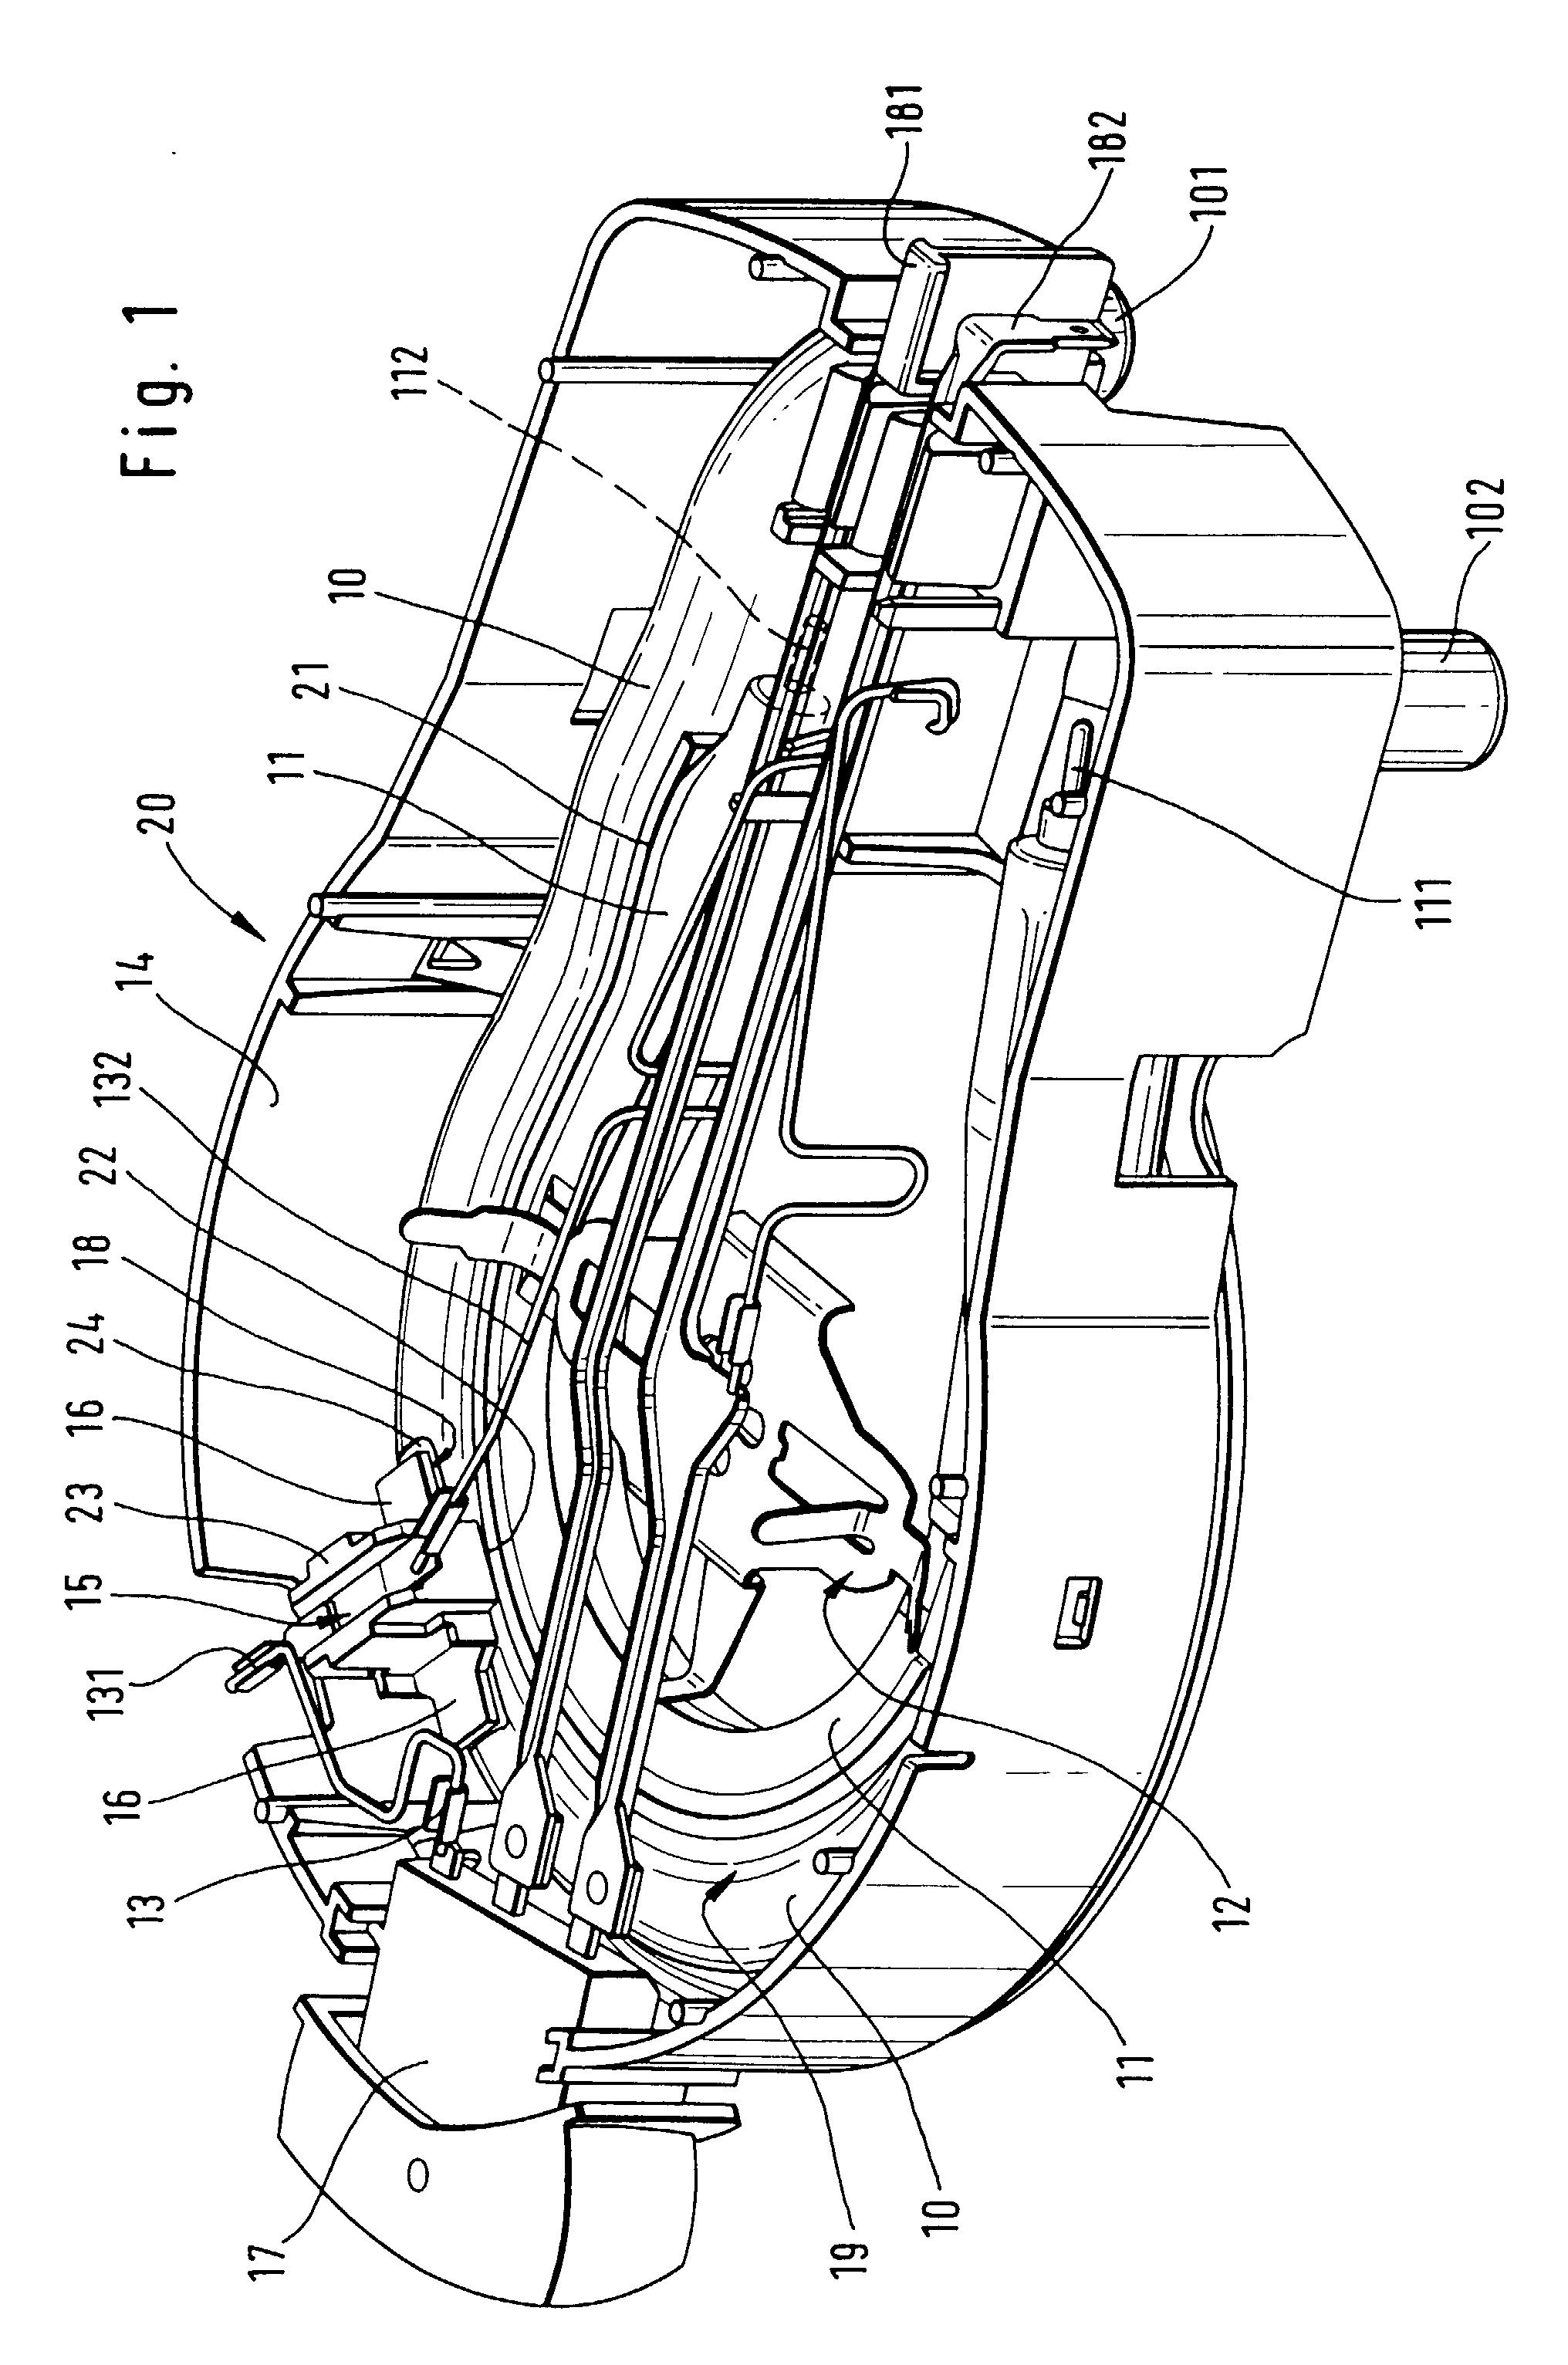 patent ep1002491a1 durchlauferhitzer f r ein. Black Bedroom Furniture Sets. Home Design Ideas